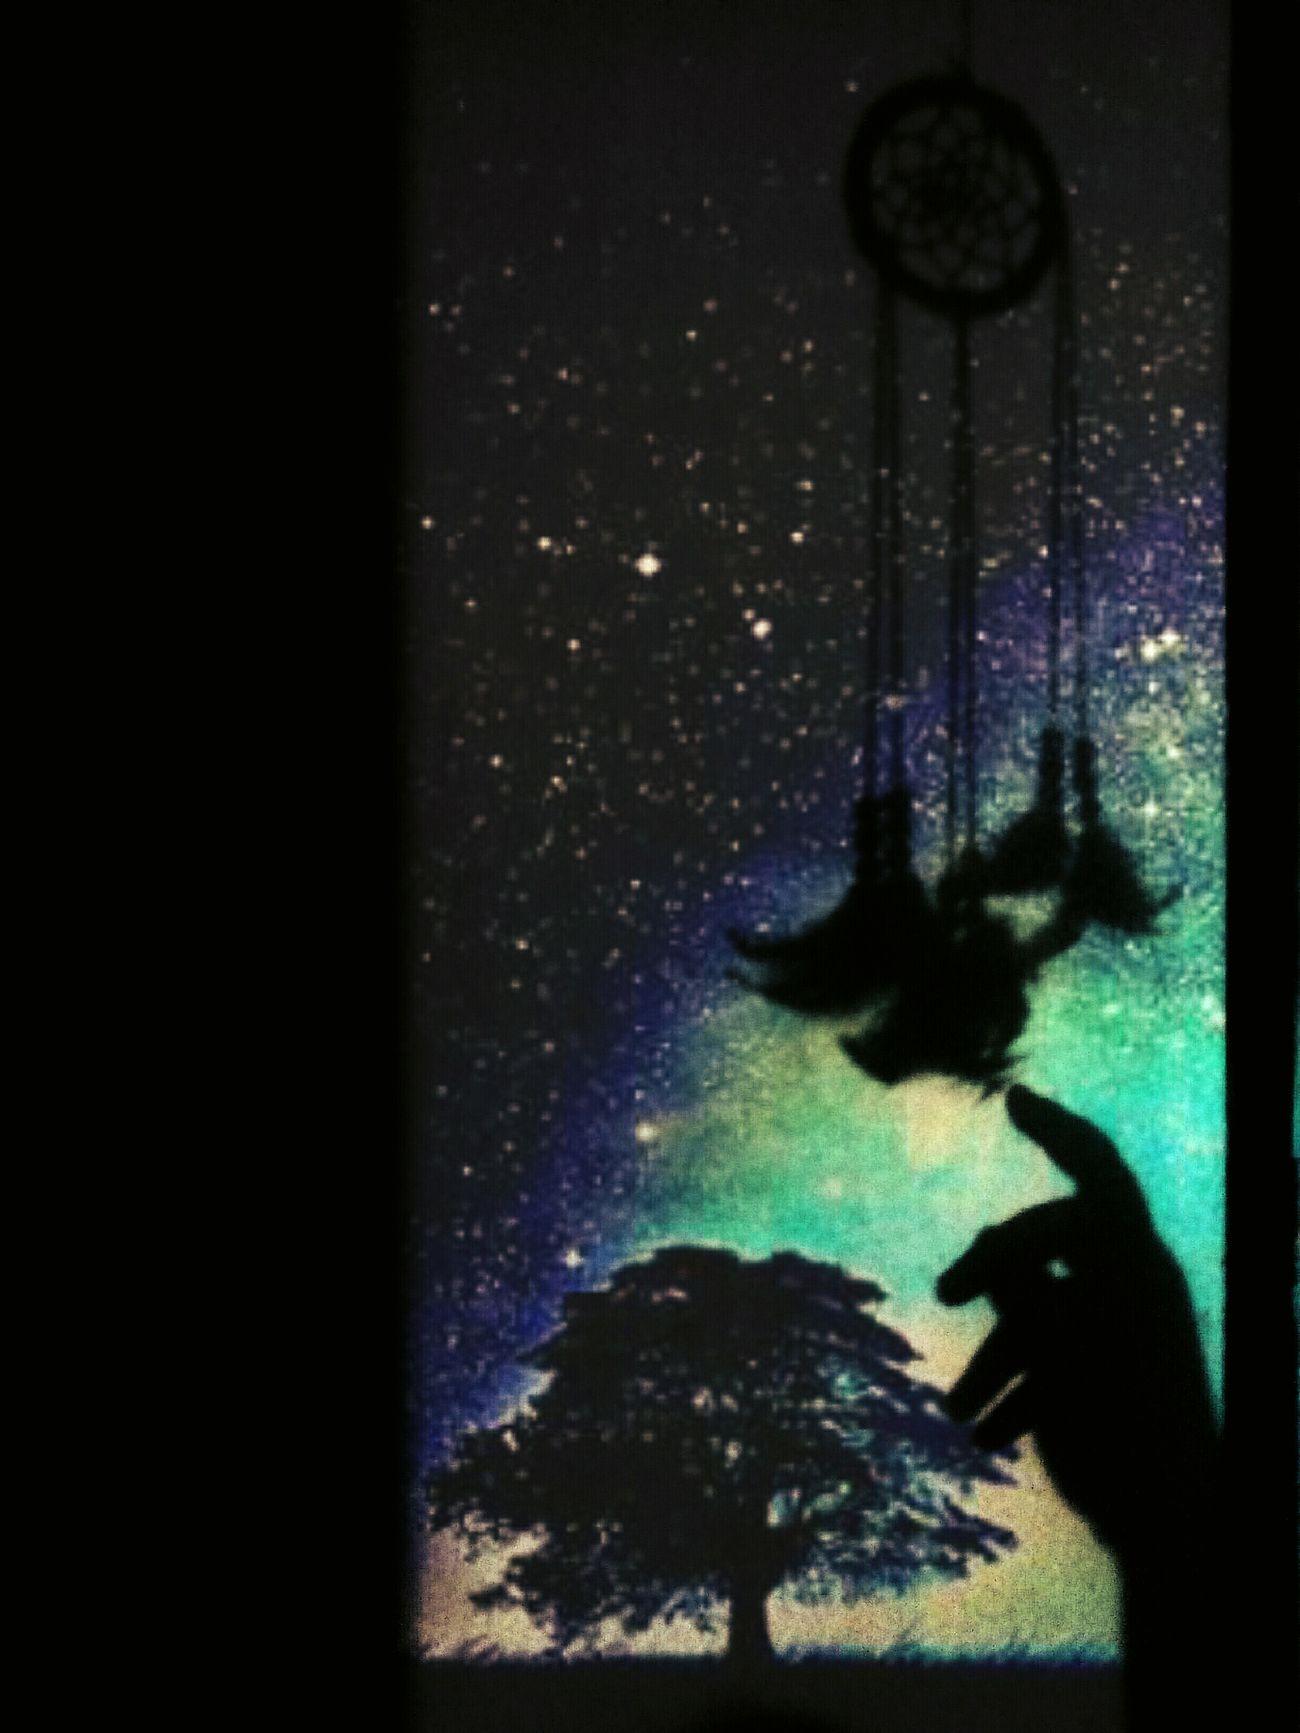 The Innovator Dreamcatcher Dream Catcher Edited Eyeem Edit Shadow Simplicity *background photo not mine *CTTO